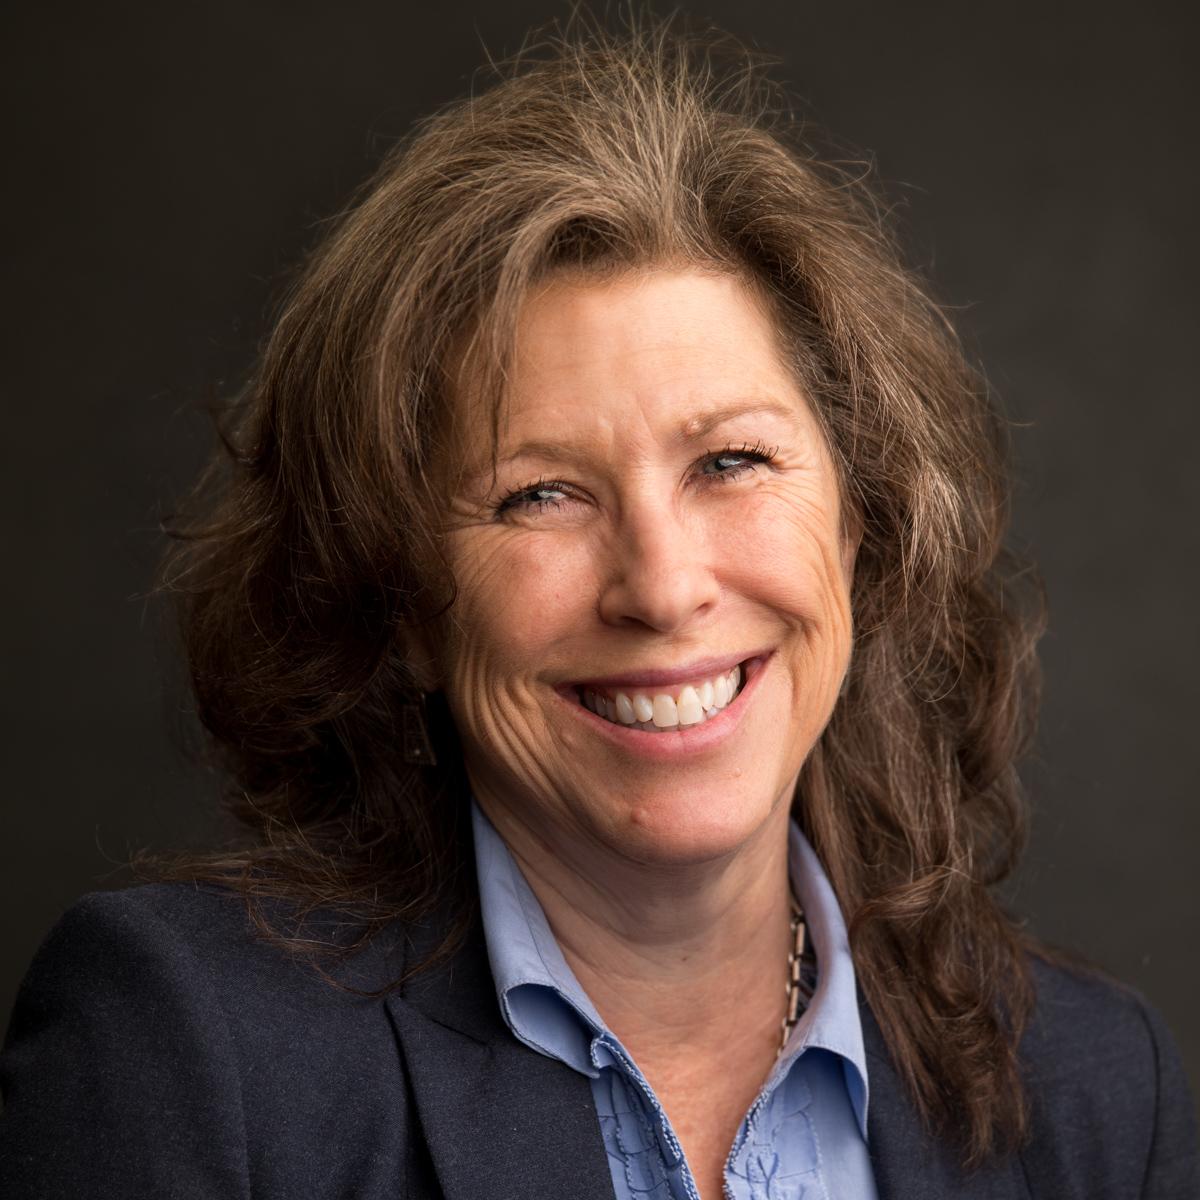 Laura Moore, RLA, ASLA - Director of Marketing | Senior Landscape Architect